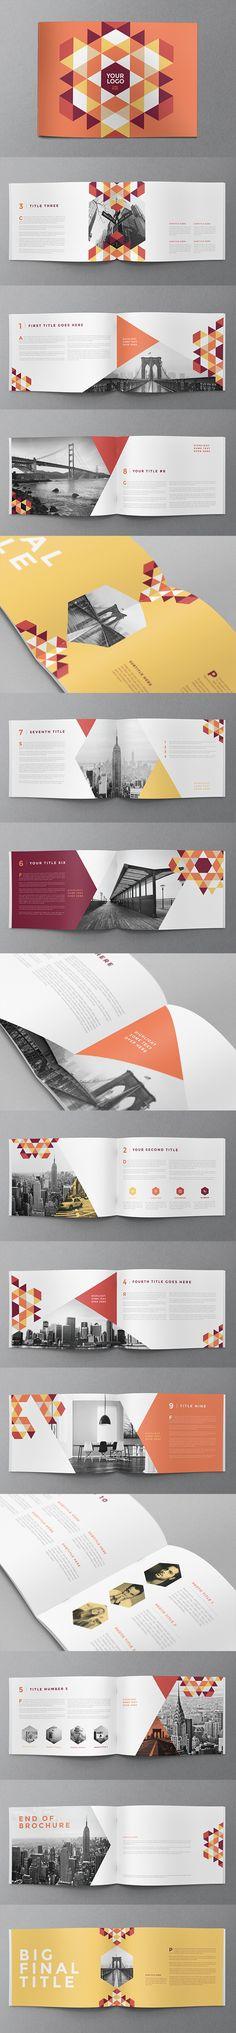 Modern Red Pattern Brochure. Download here: http://graphicriver.net/item/modern-red-pattern-brochure/11973823?ref=abradesign #brochure #design #layout